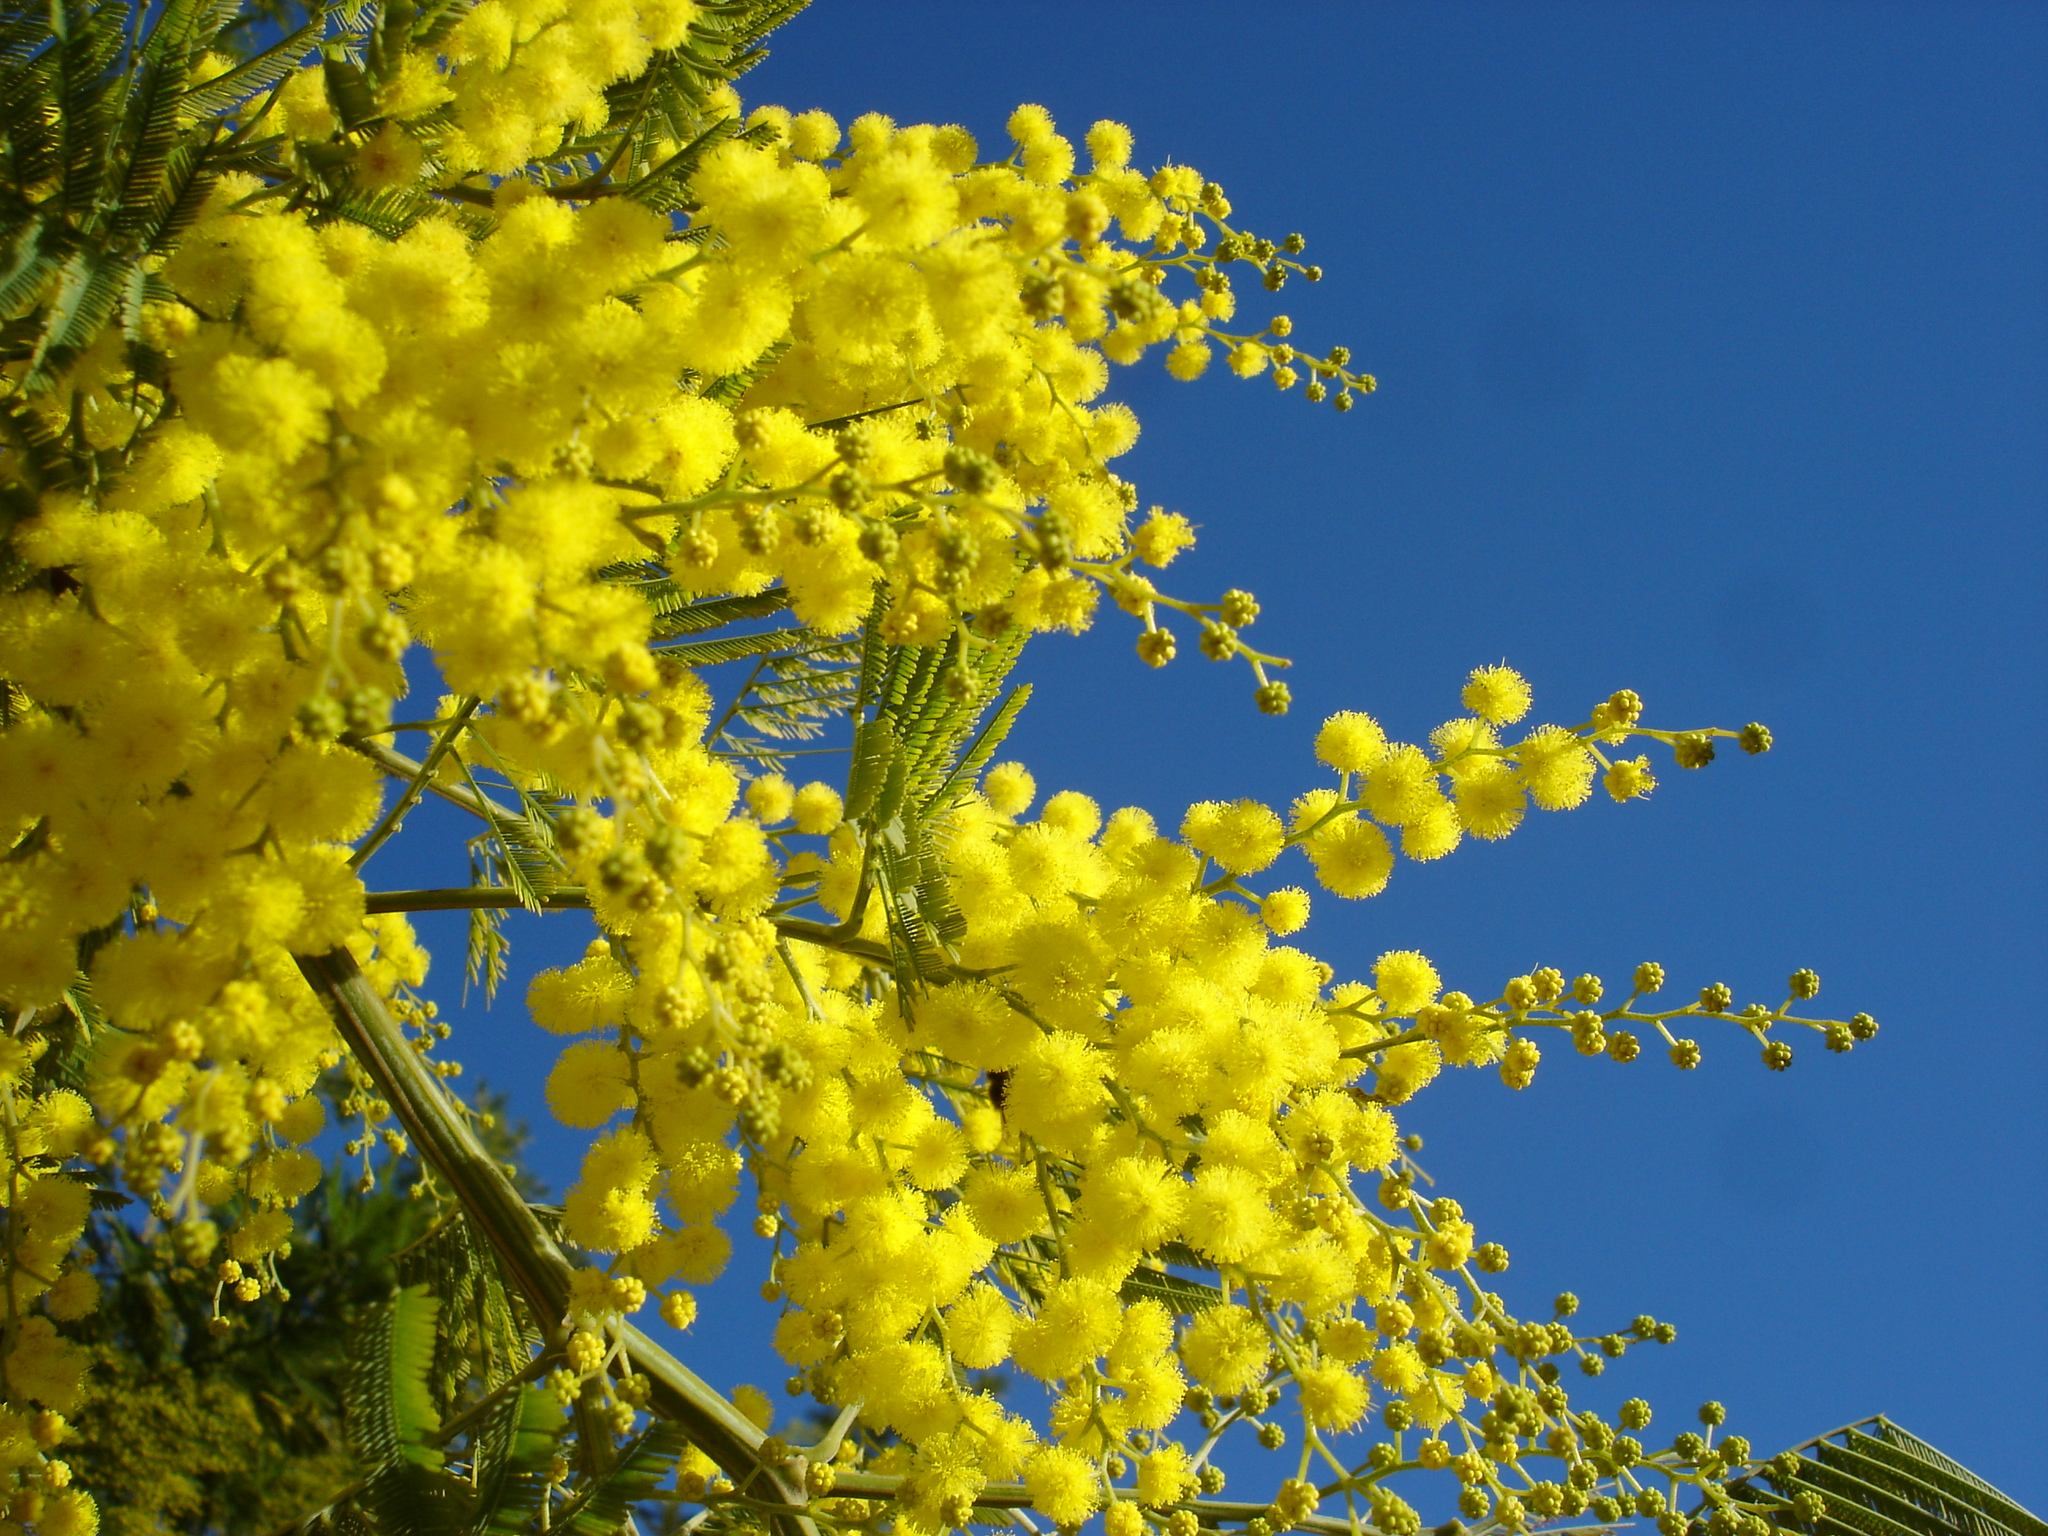 Цветок «мимоза или Акация серебристая. Описание 46